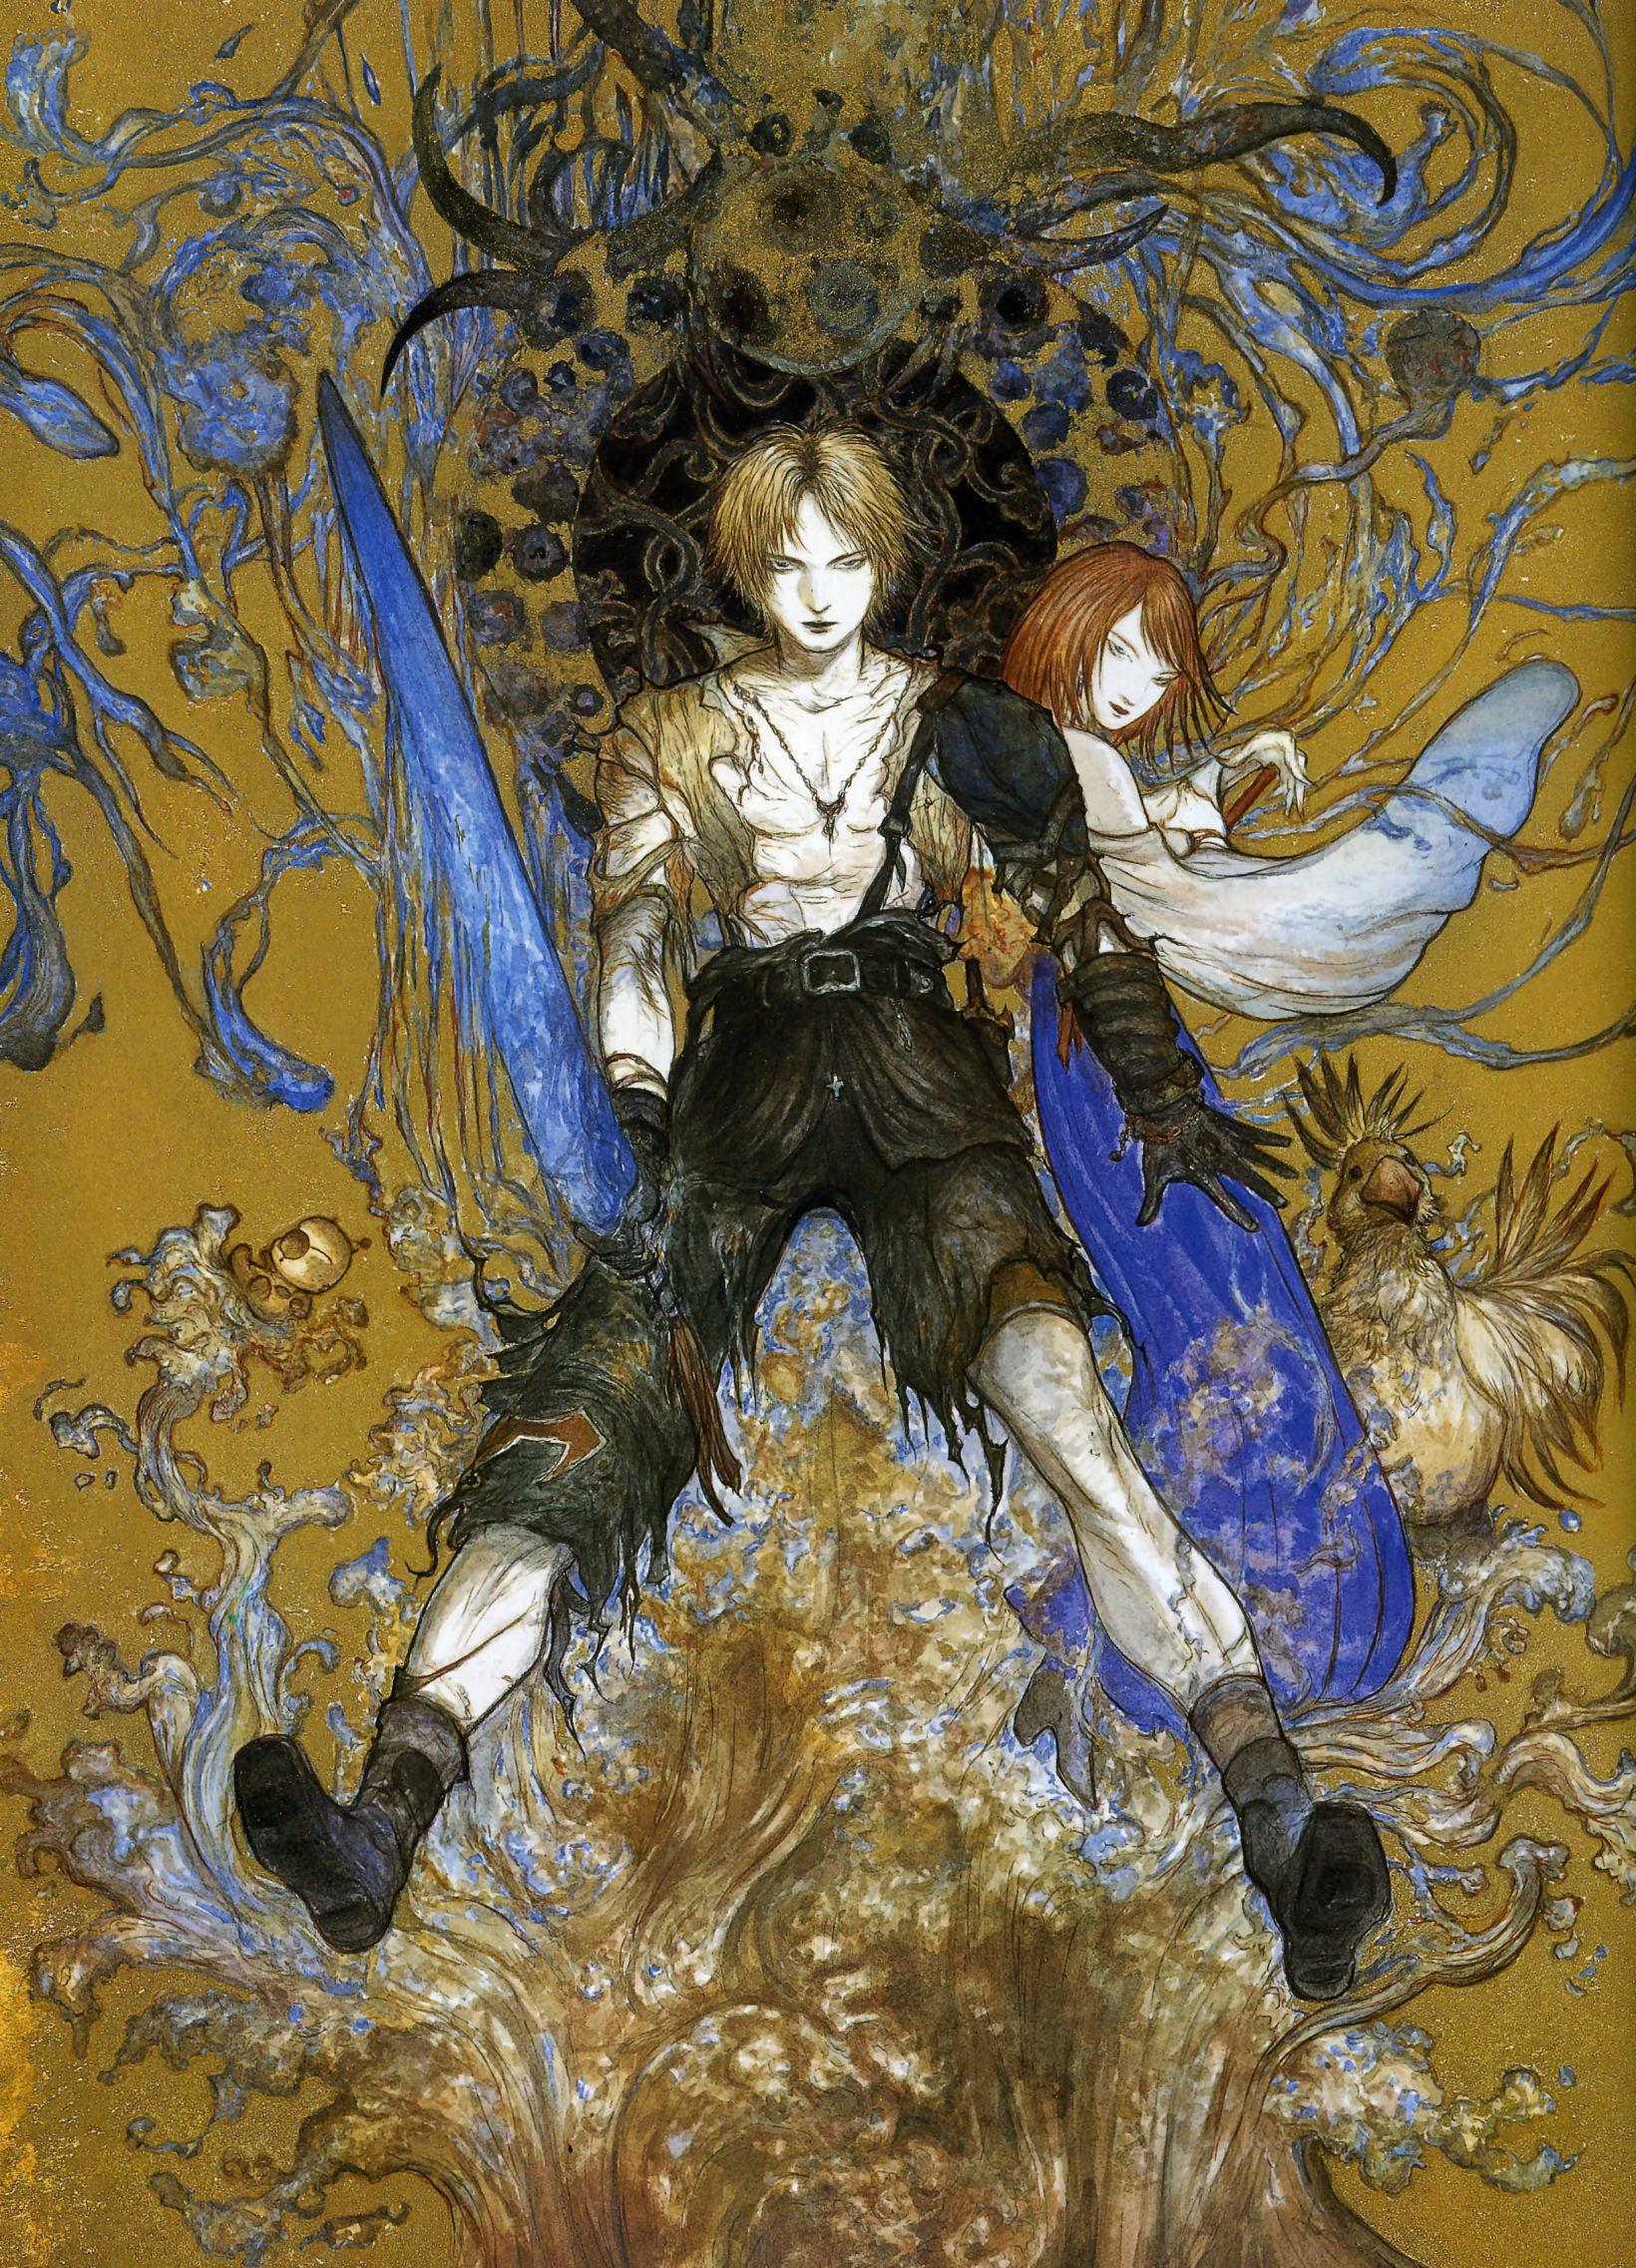 Res: 1640x2273, Final Fantasy X · download Final Fantasy X image